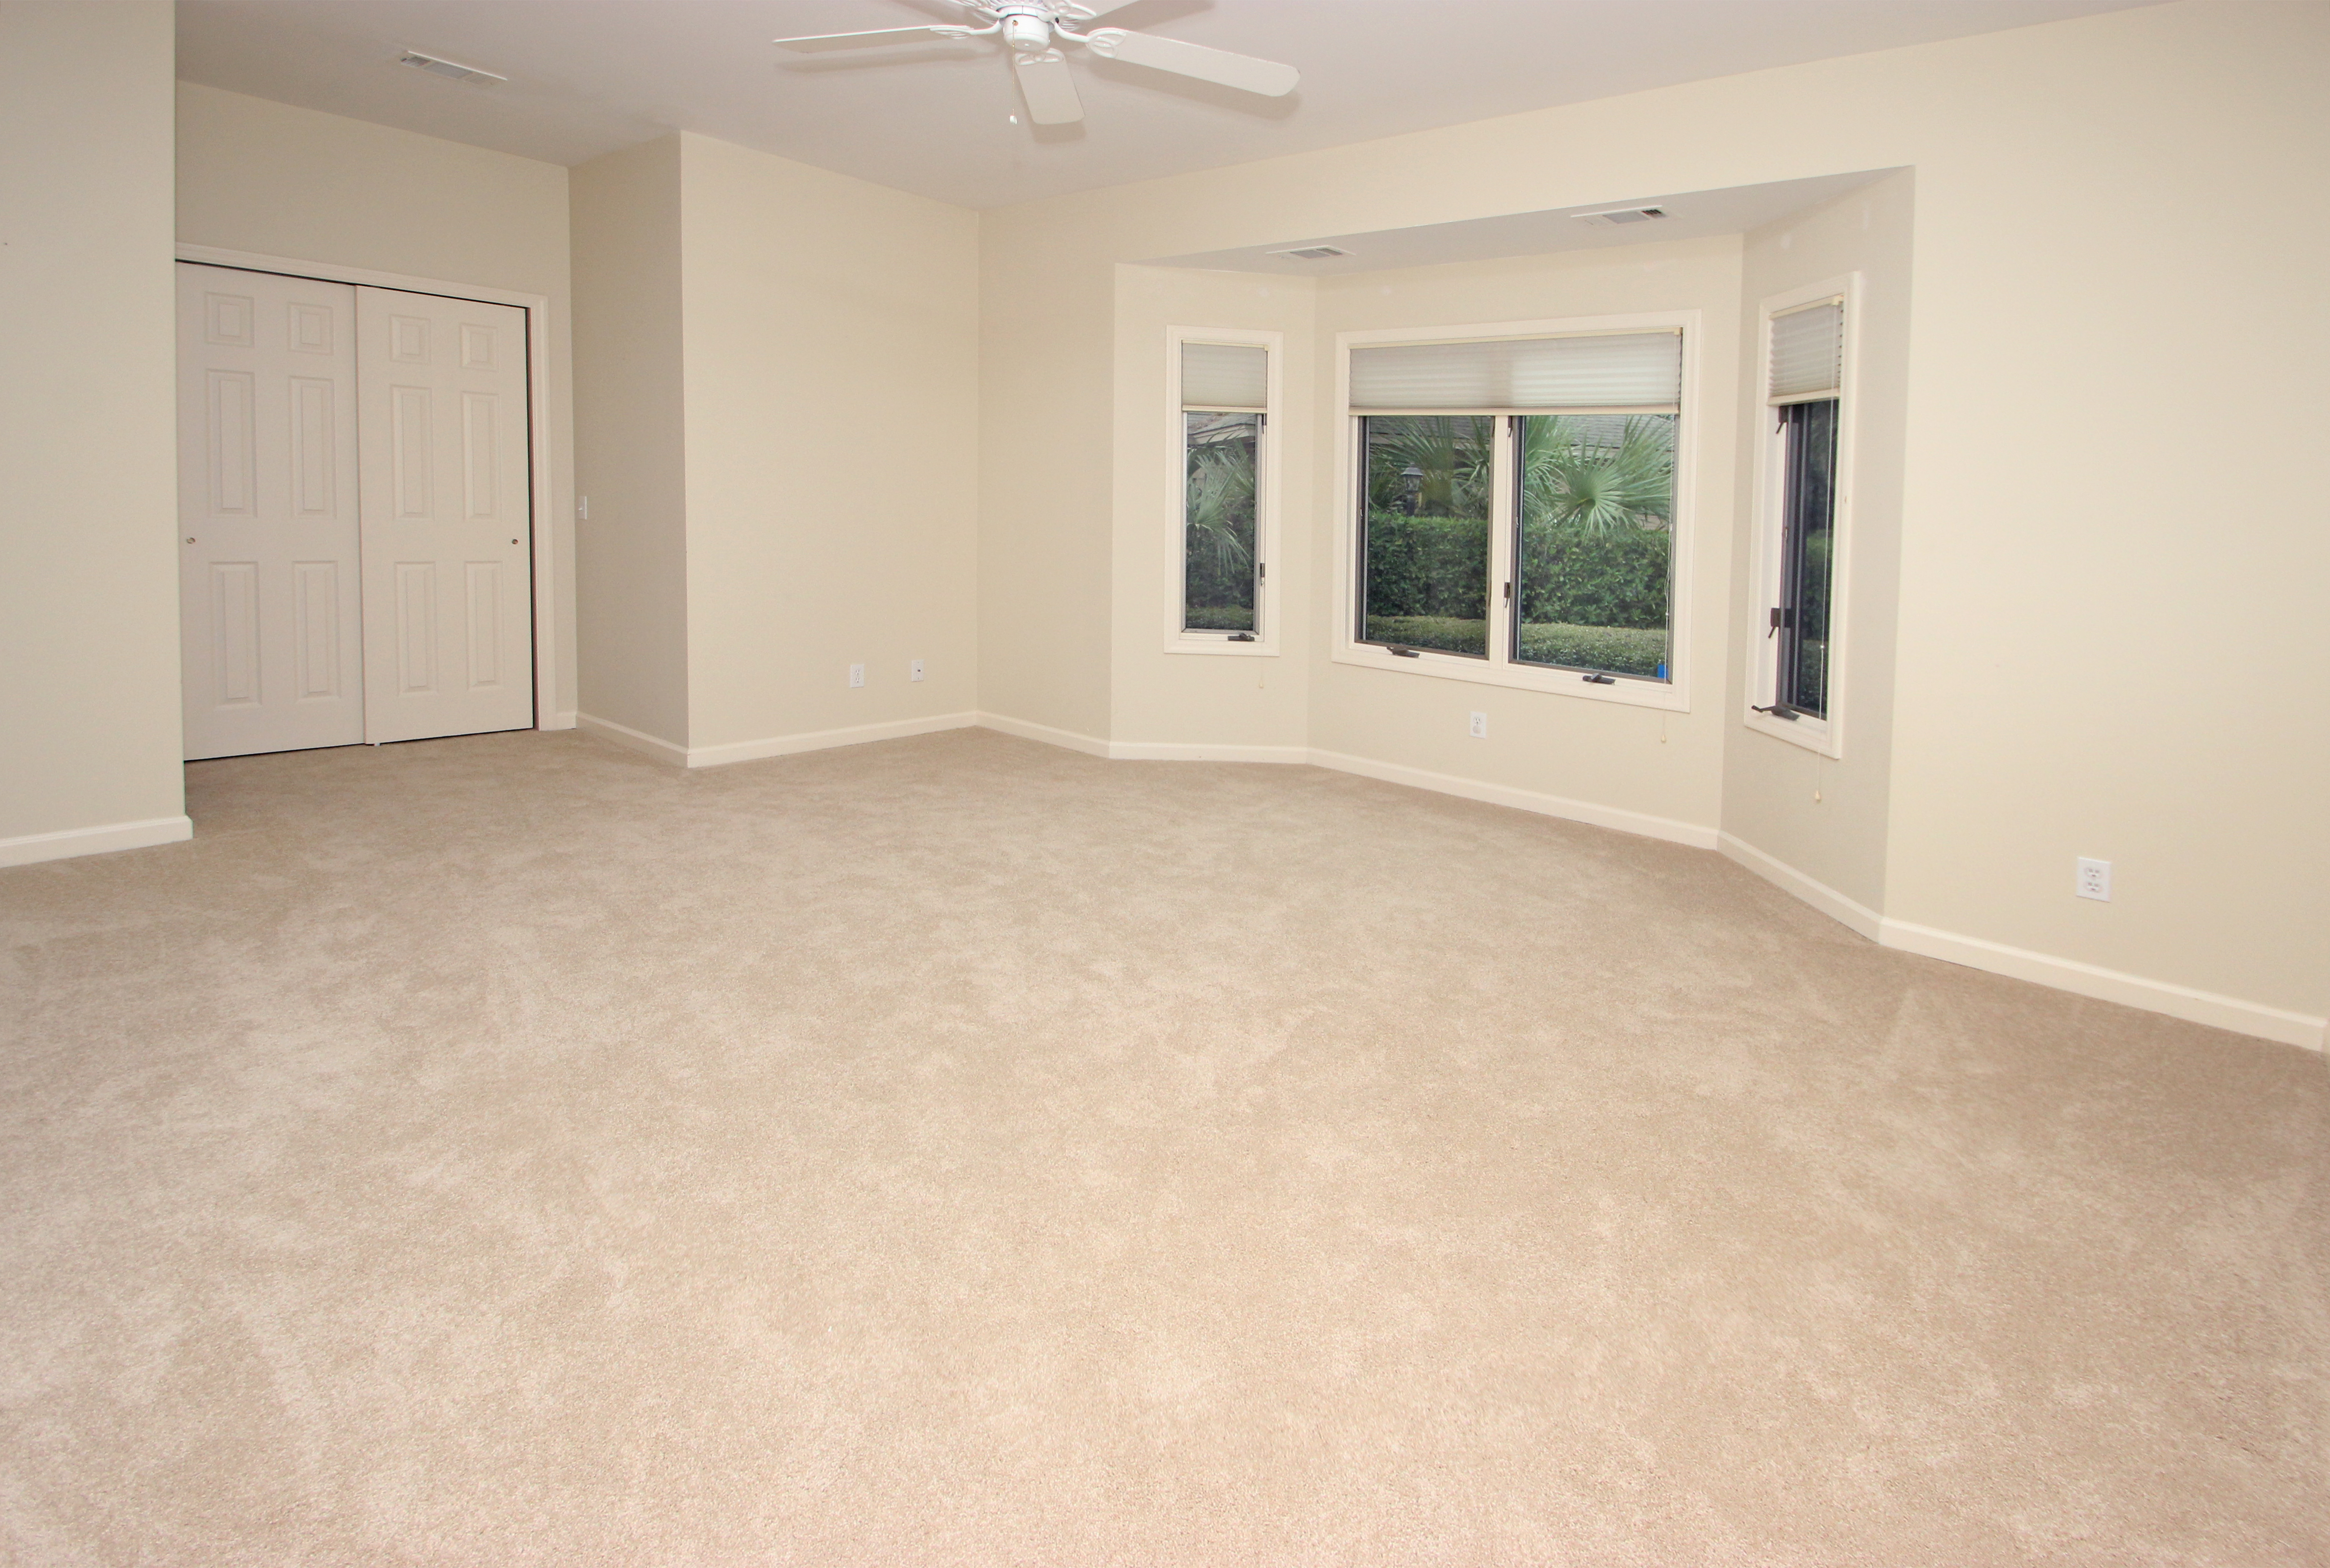 HI - Guest bedroom - 1st level